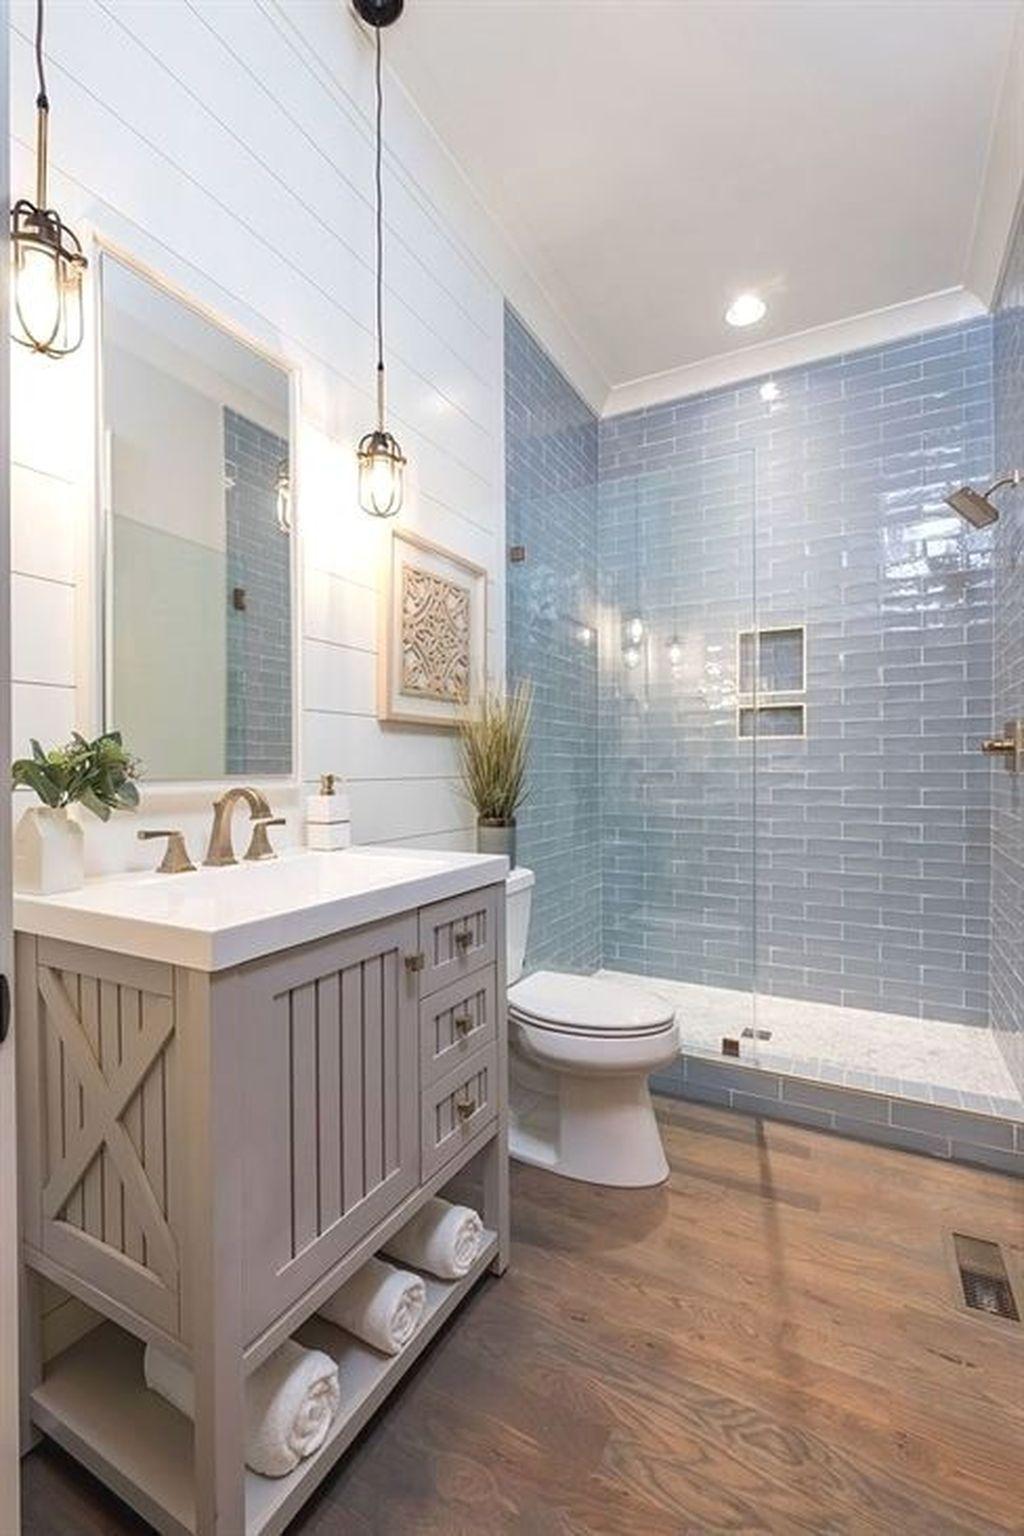 Lovely Bathroom Ceramic Tile Ideas You Should Copy 12